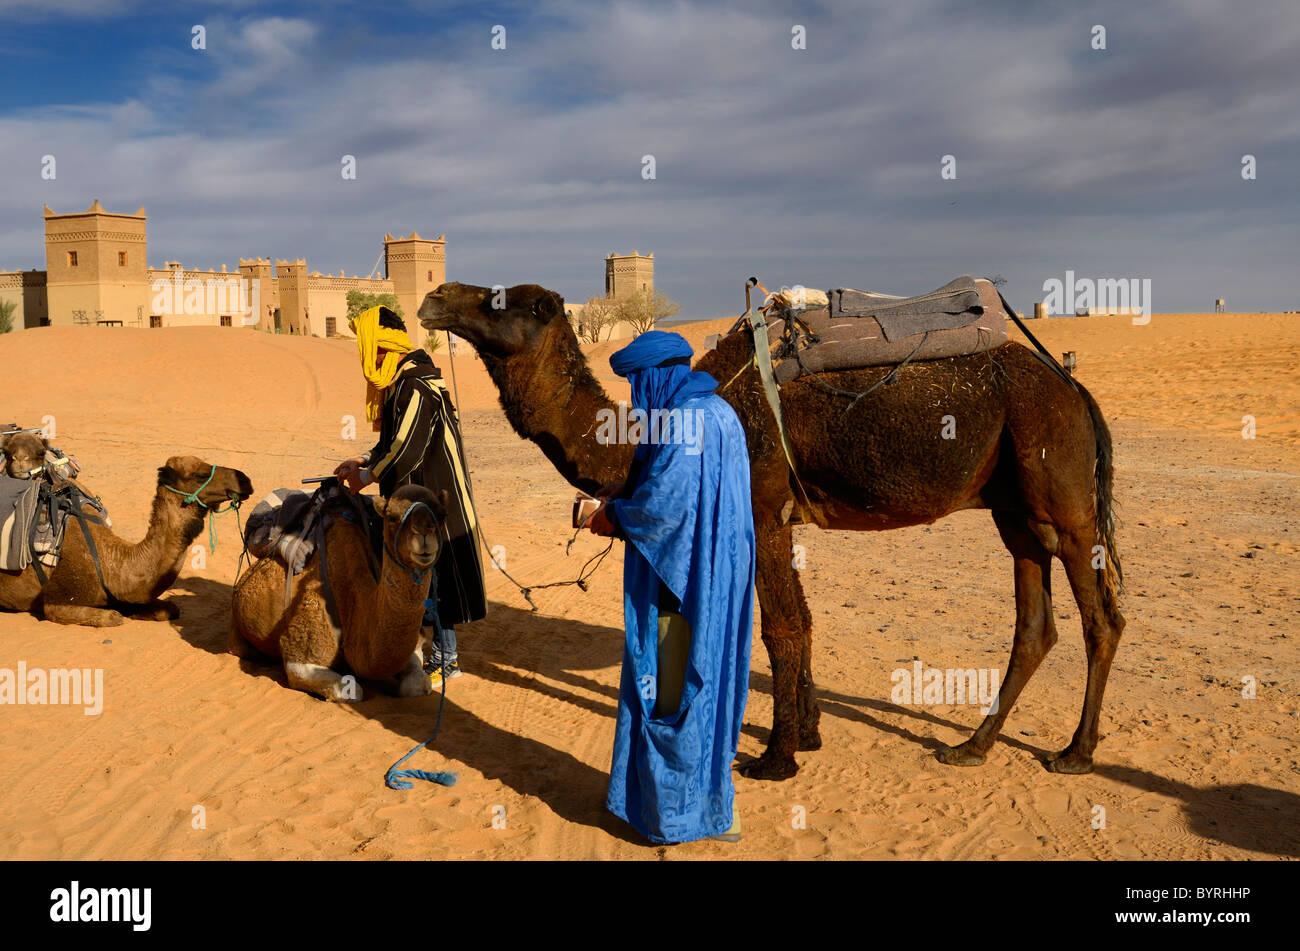 Berber men tending Dromedary camels after a morning ride in Erg Chebbi desert at Auberge du Sud Morocco - Stock Image